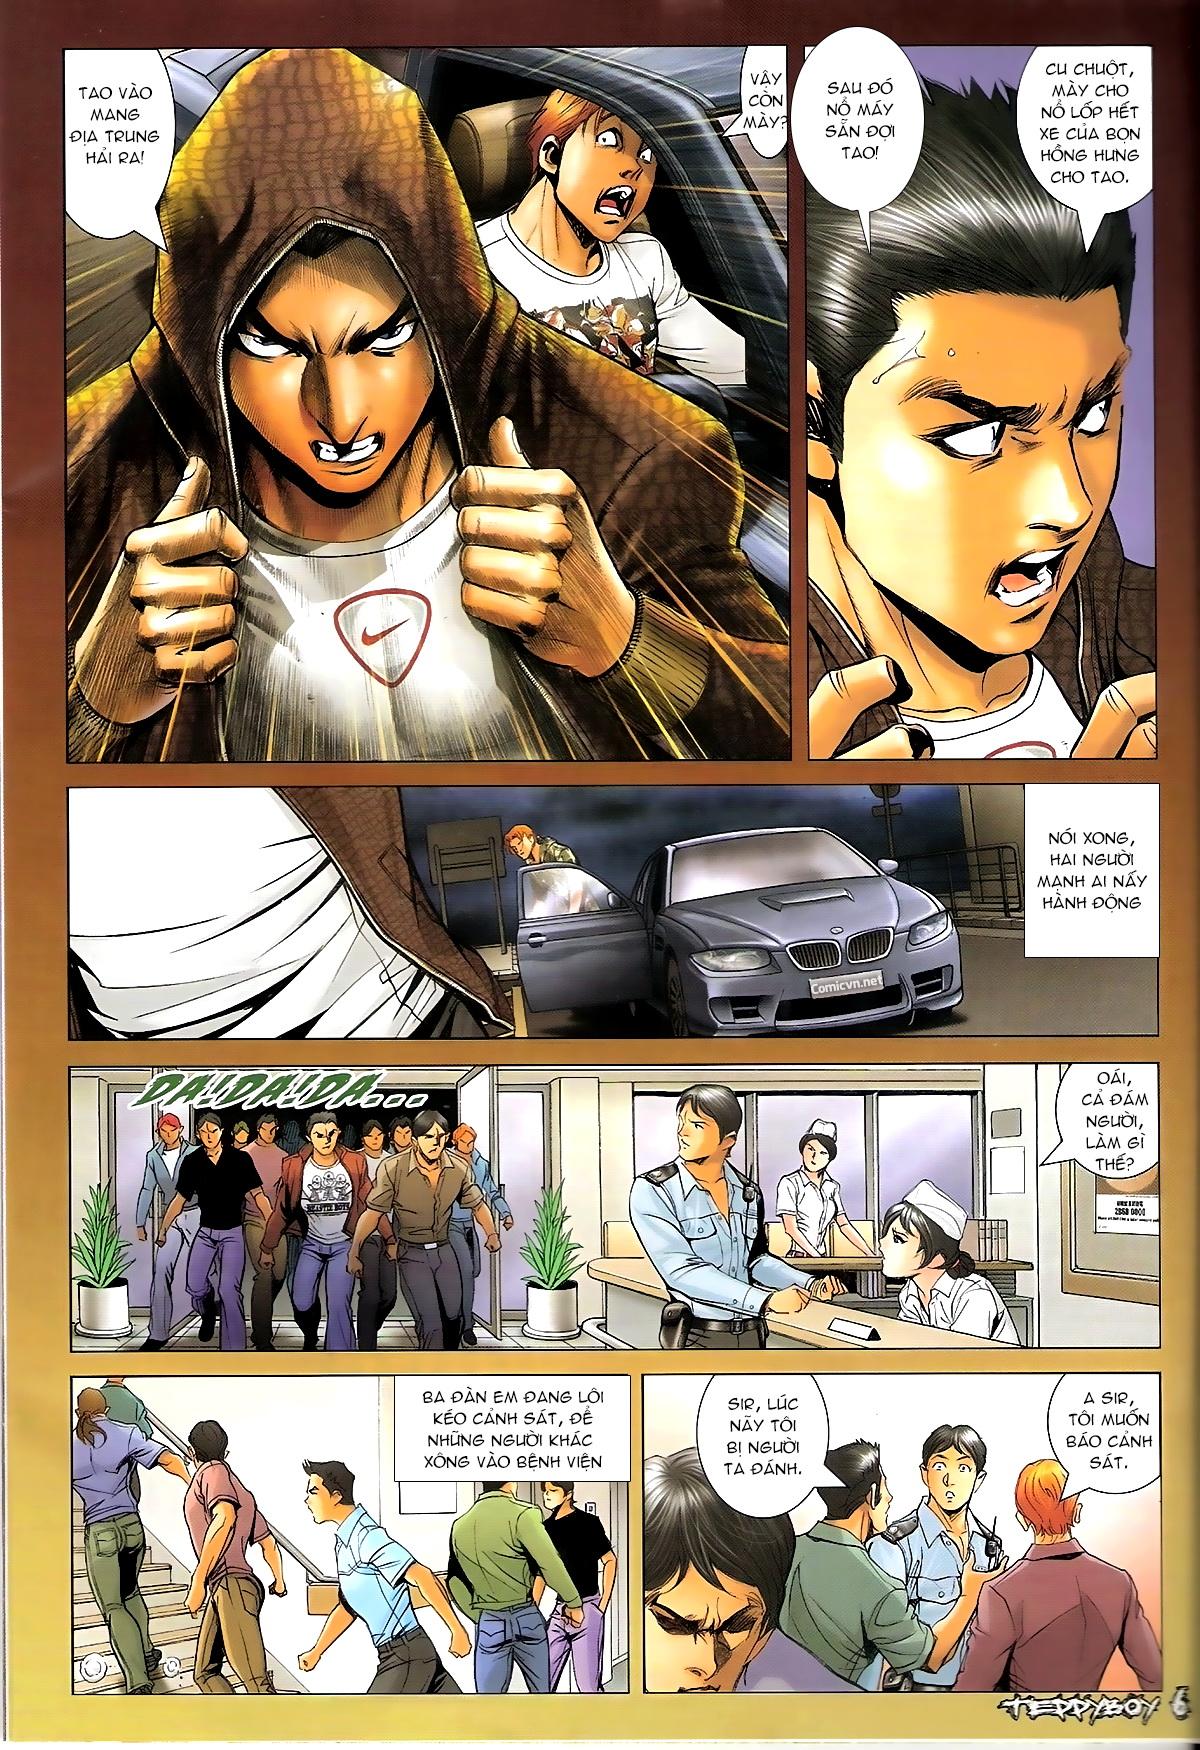 Người Trong Giang Hồ - Chapter 1317: Tao phải thắng lão - Pic 4